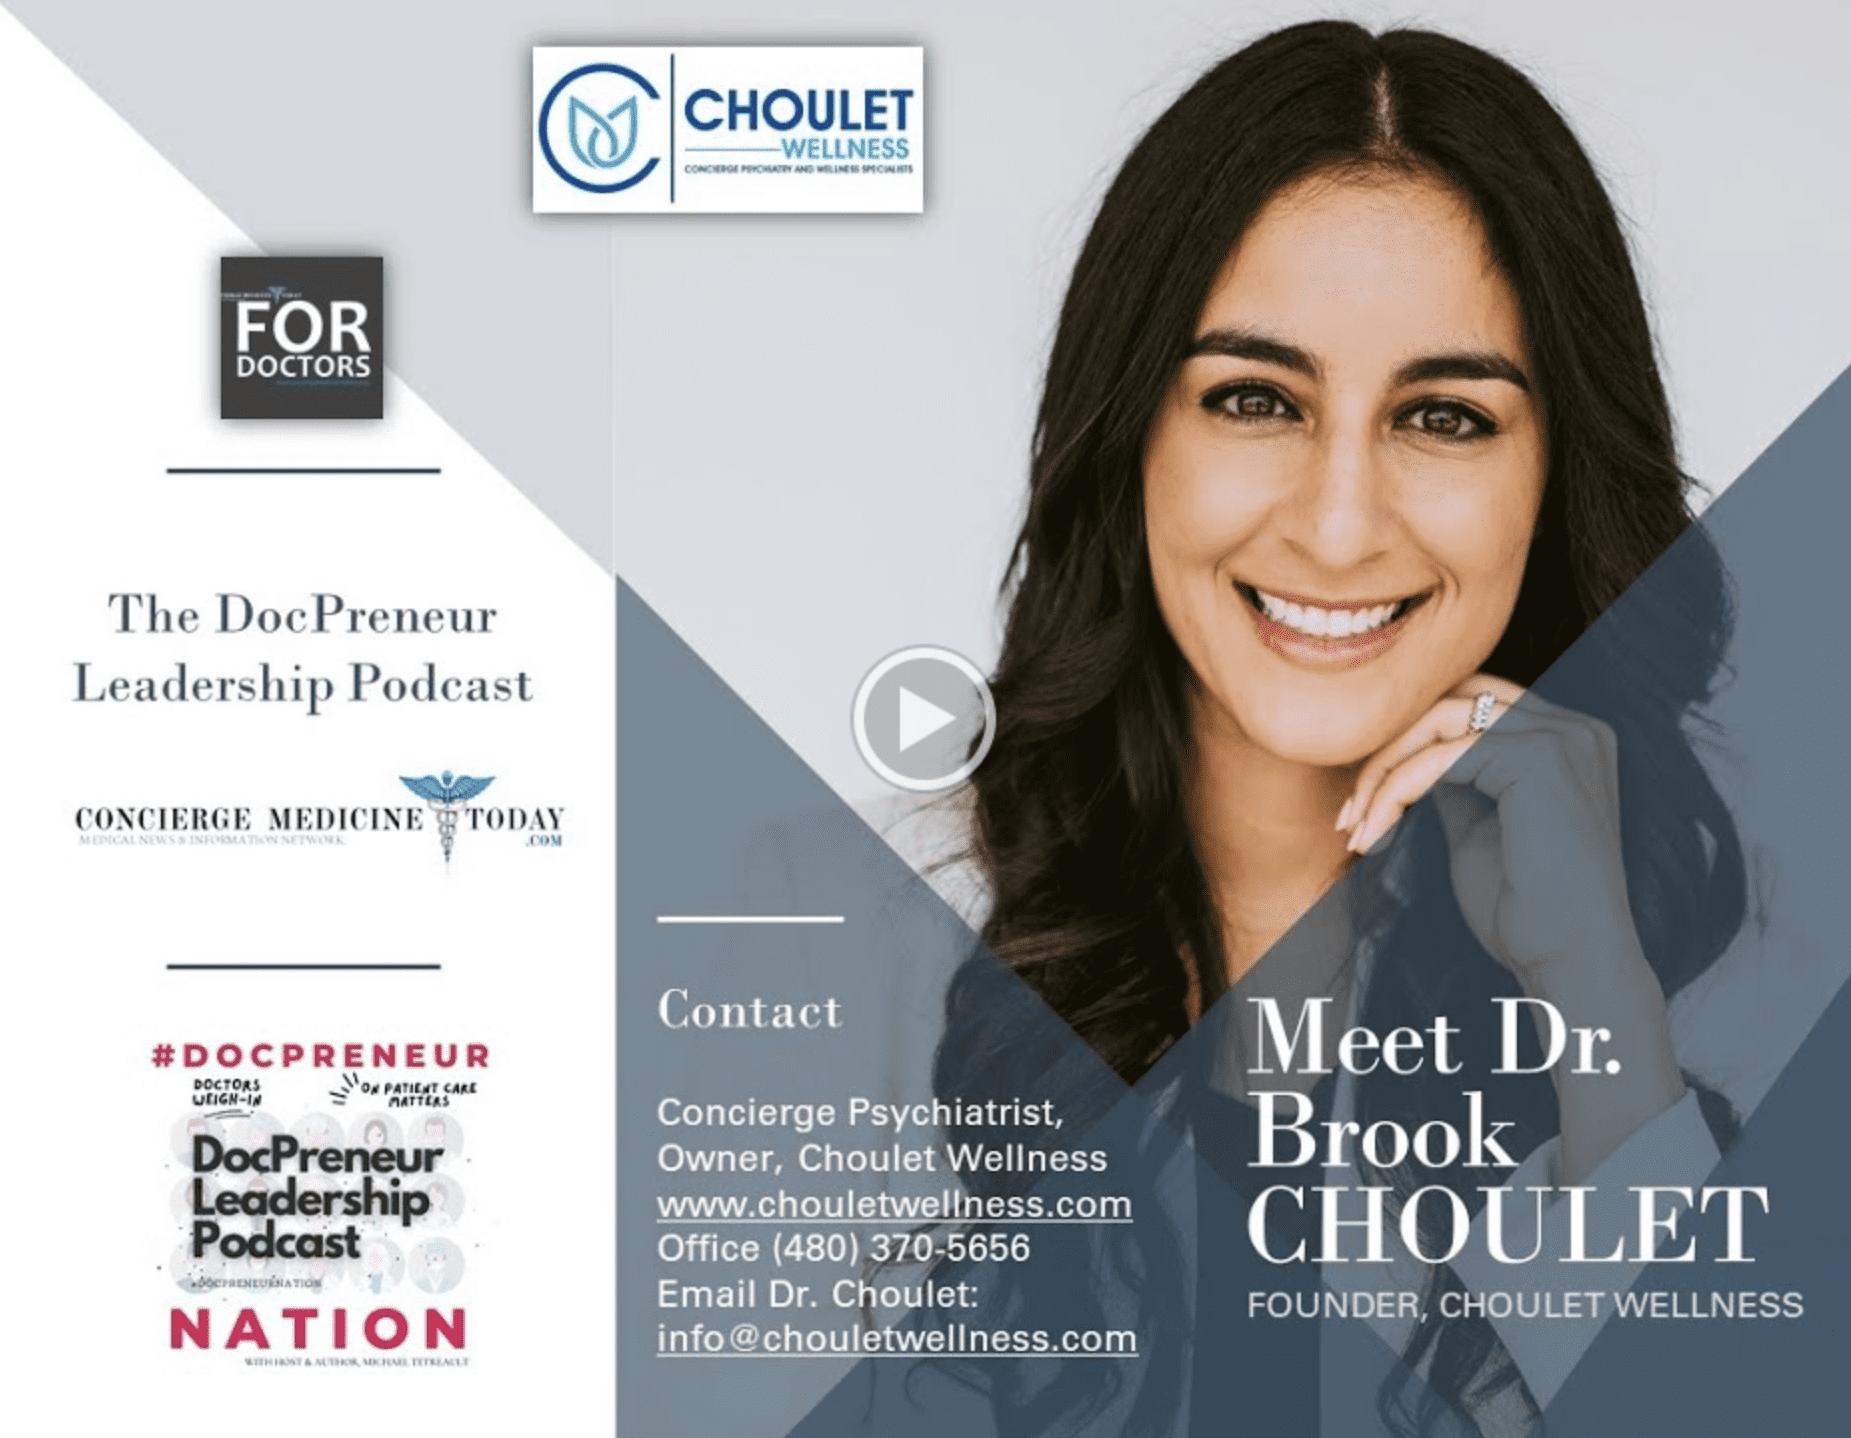 Choulet wellness